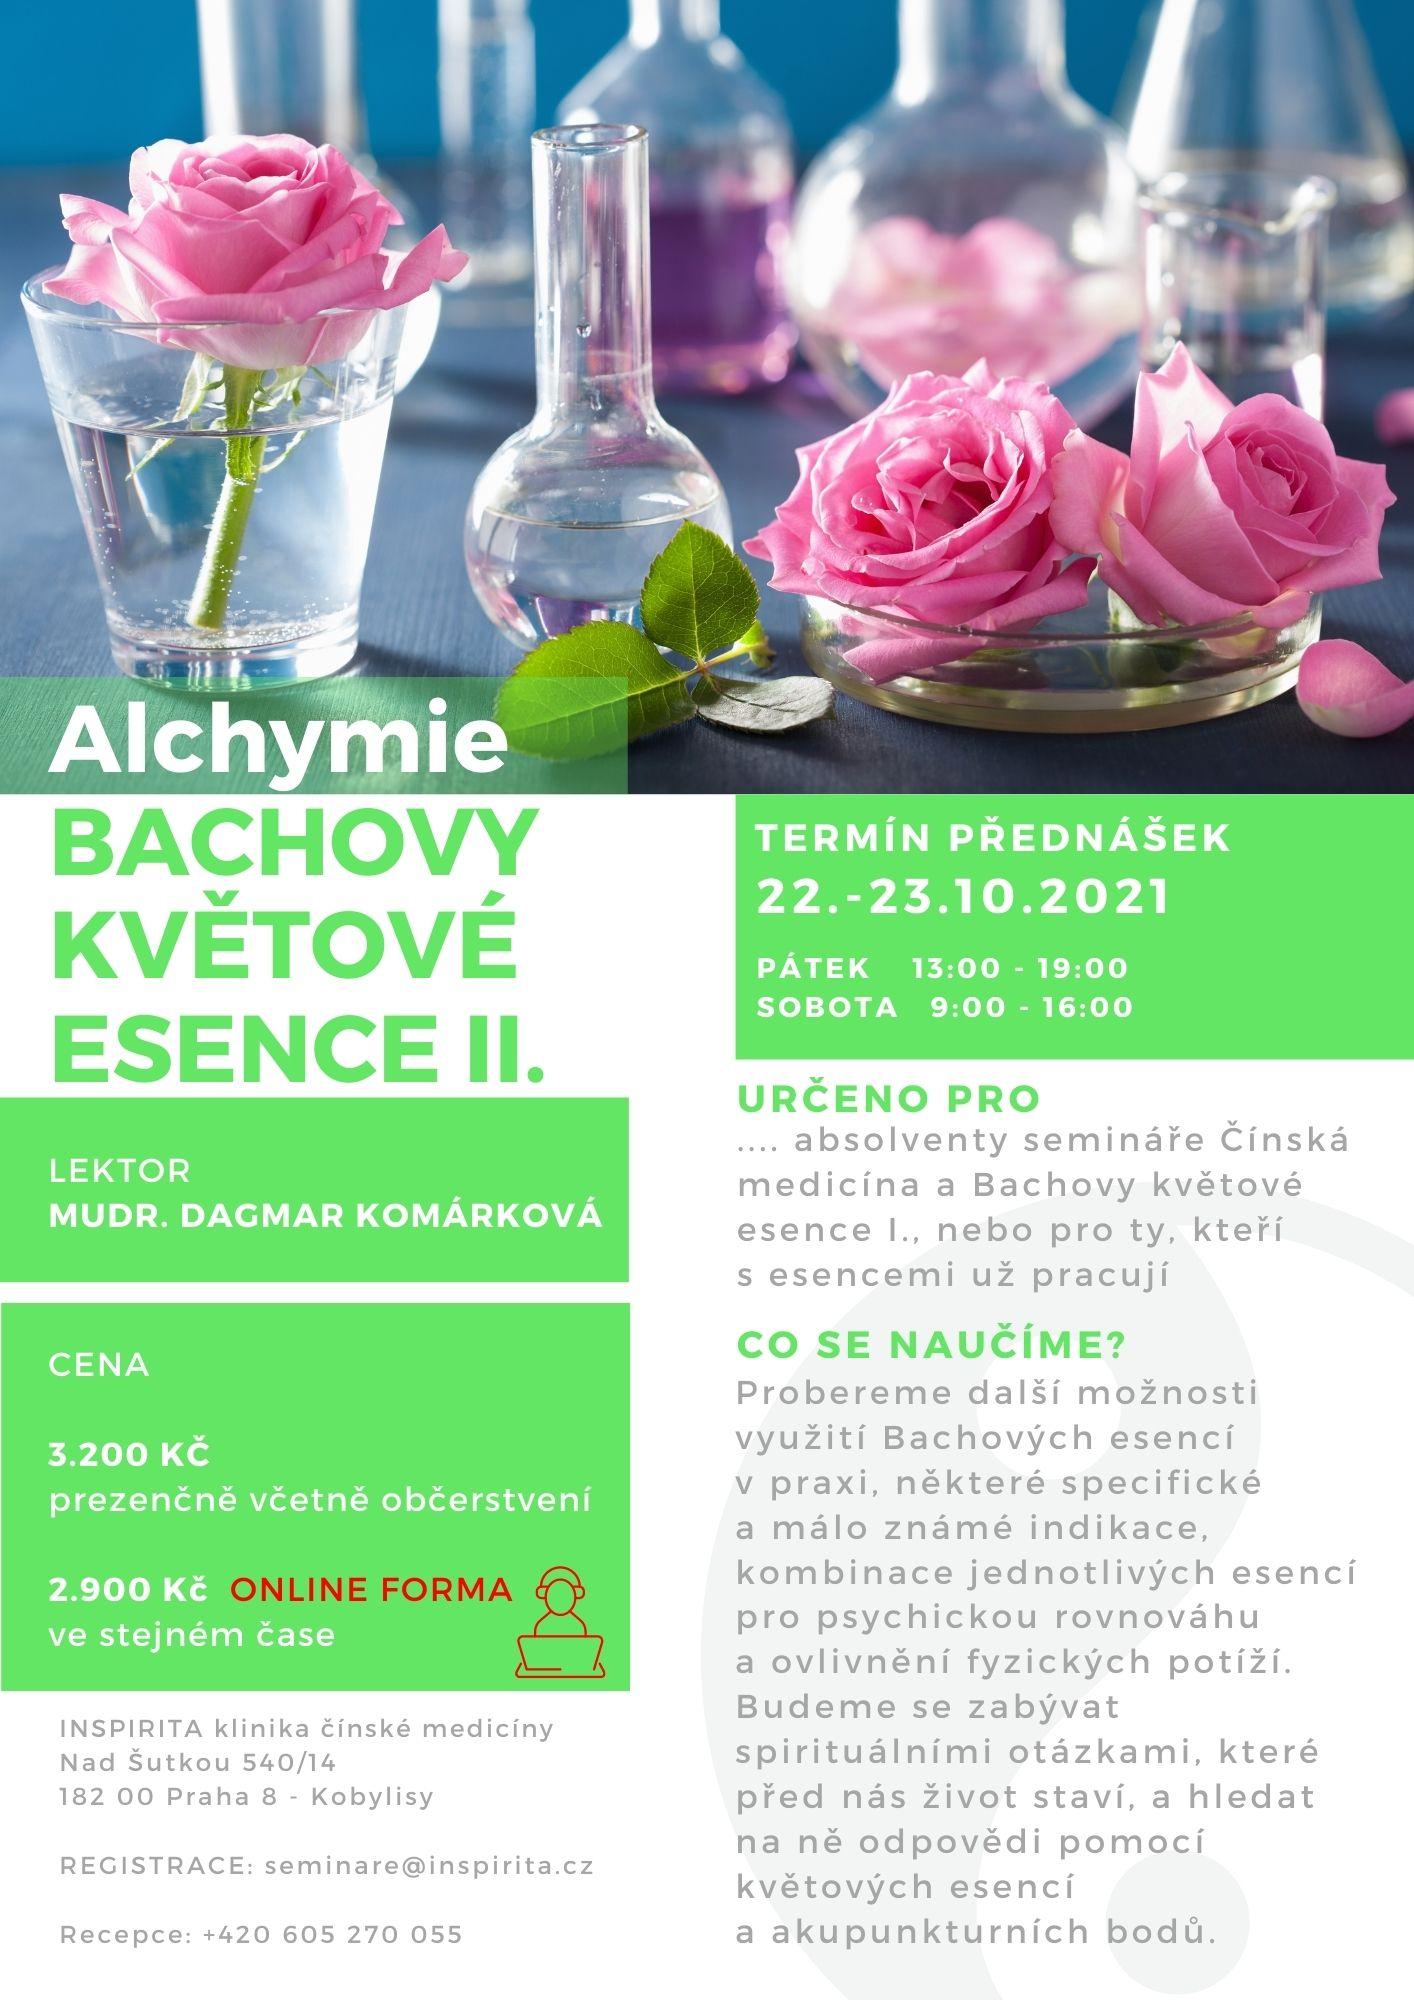 Alchymie a Bachovy esence